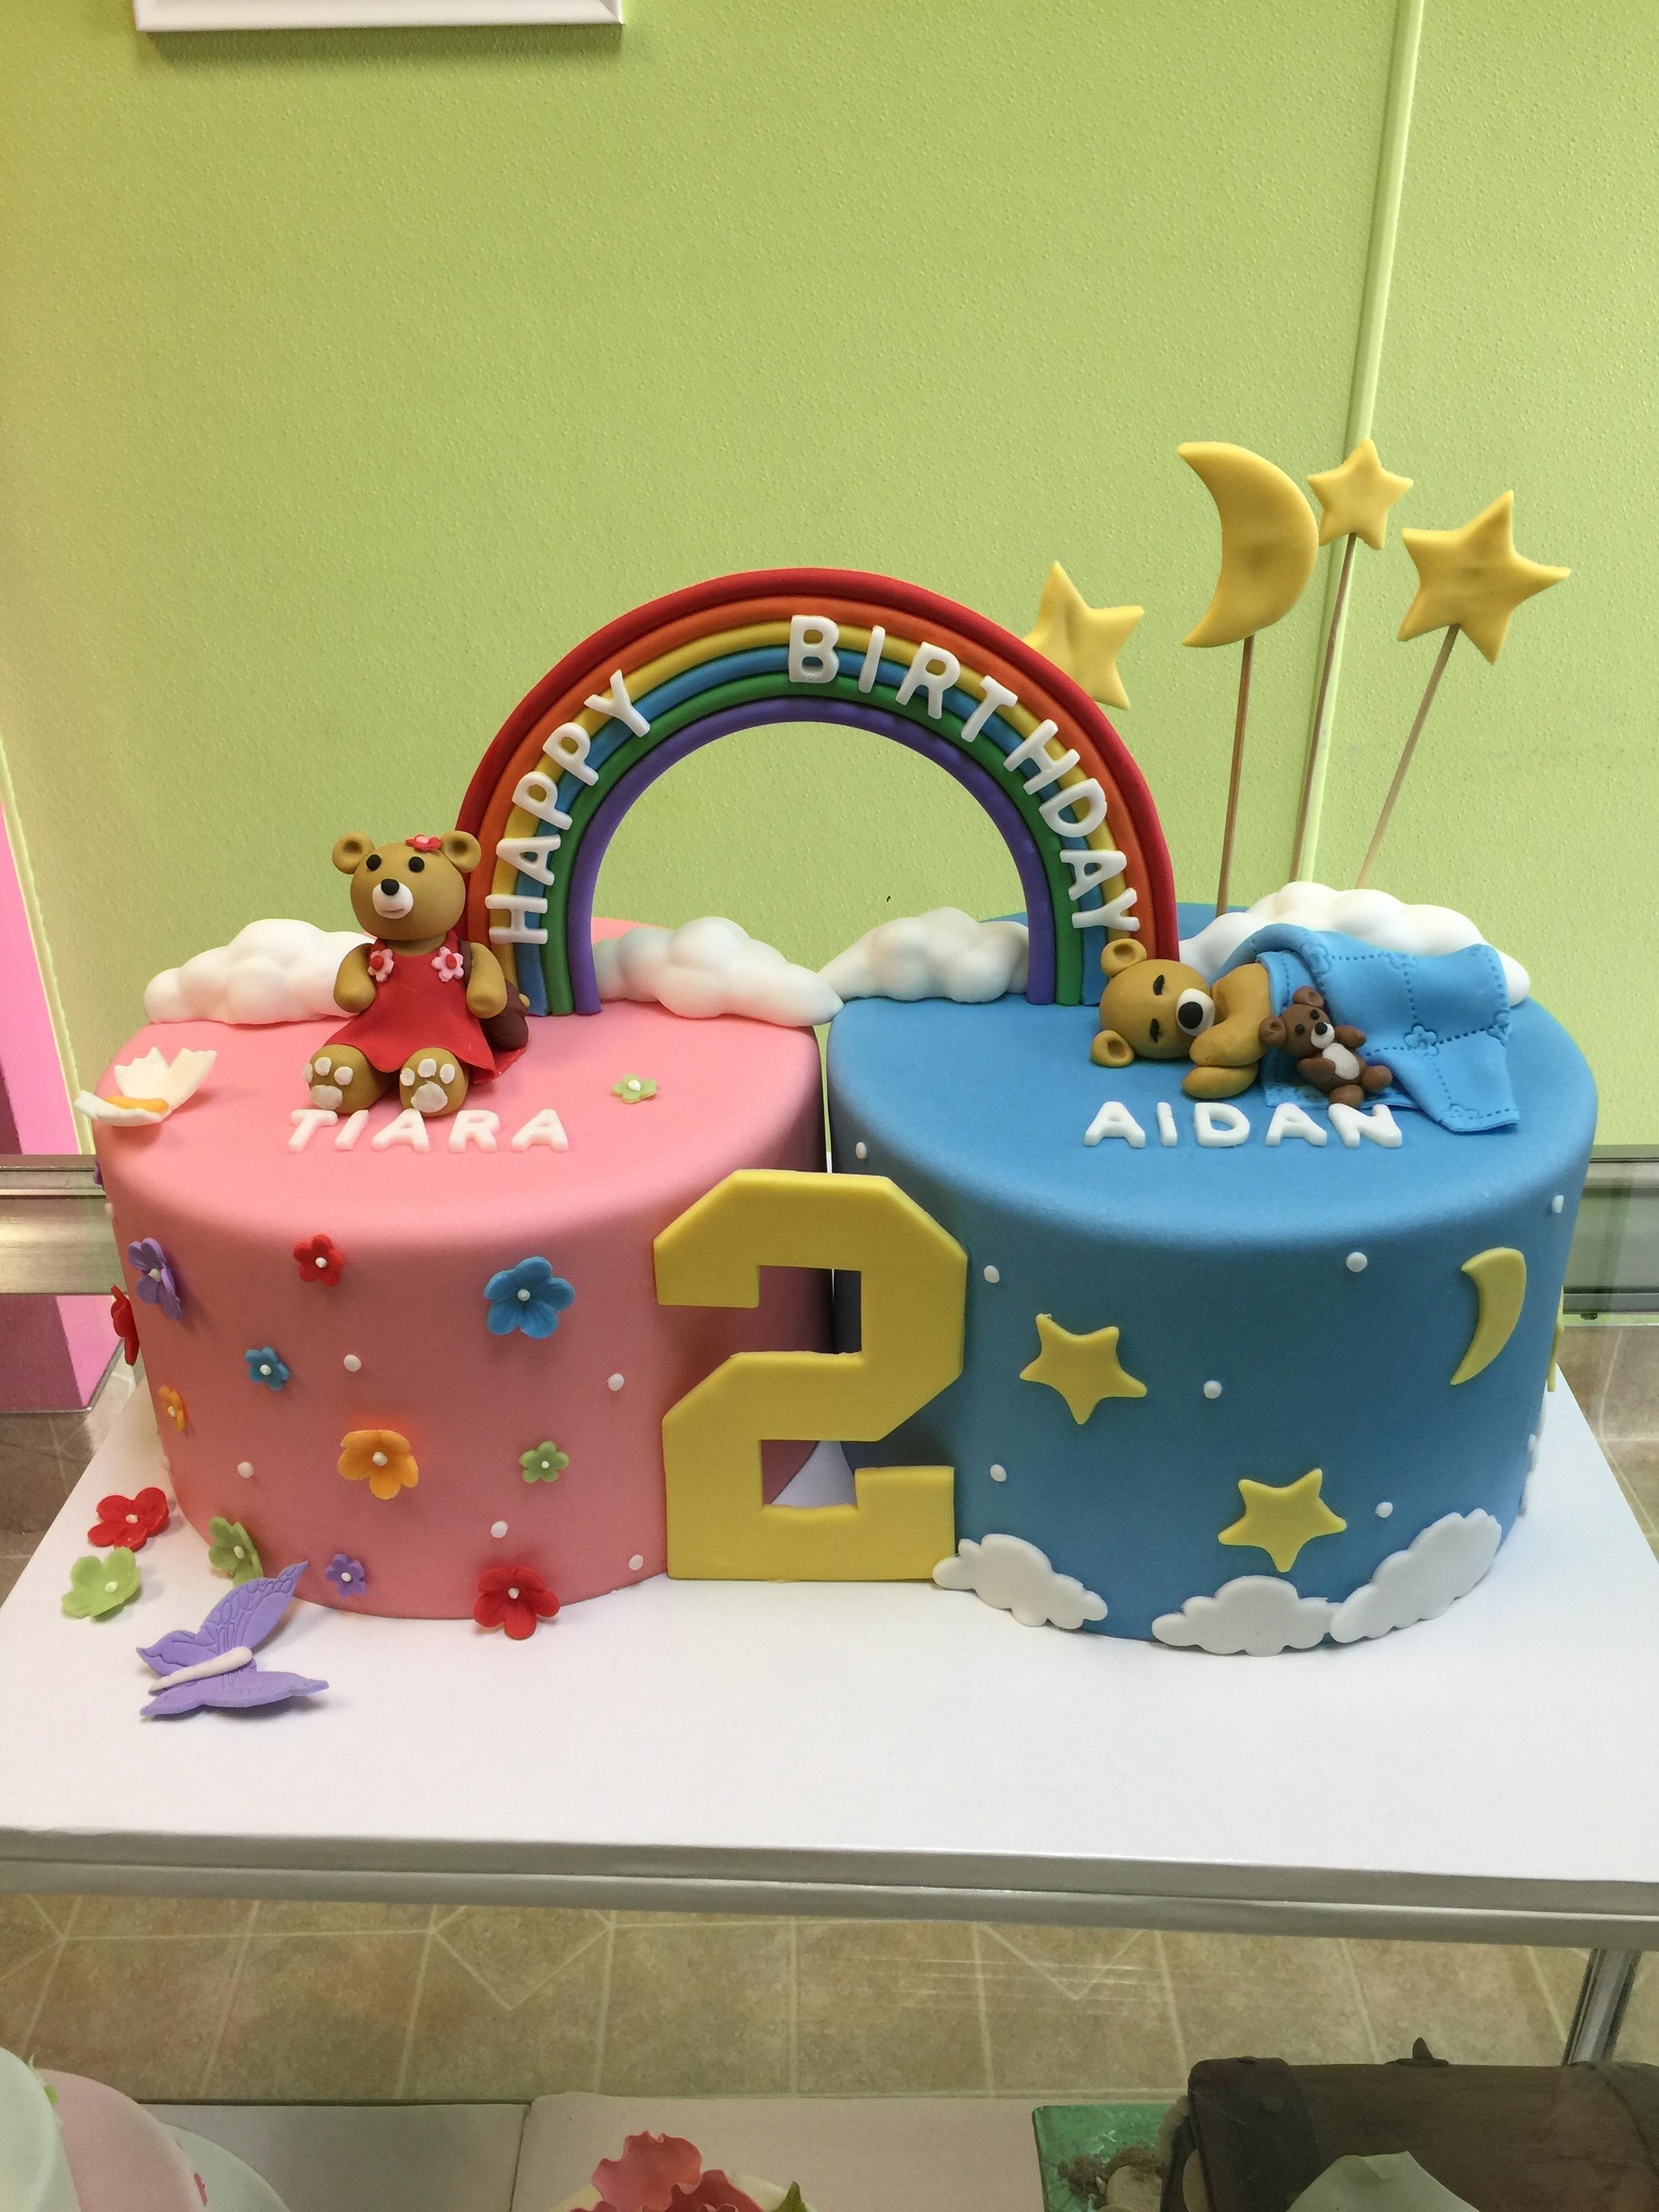 2972, second birthday, 2nd birthday, rainbow, bear, bears, teddy bear, flower, flowers, star, stars, moon, clouds, cloud, twin